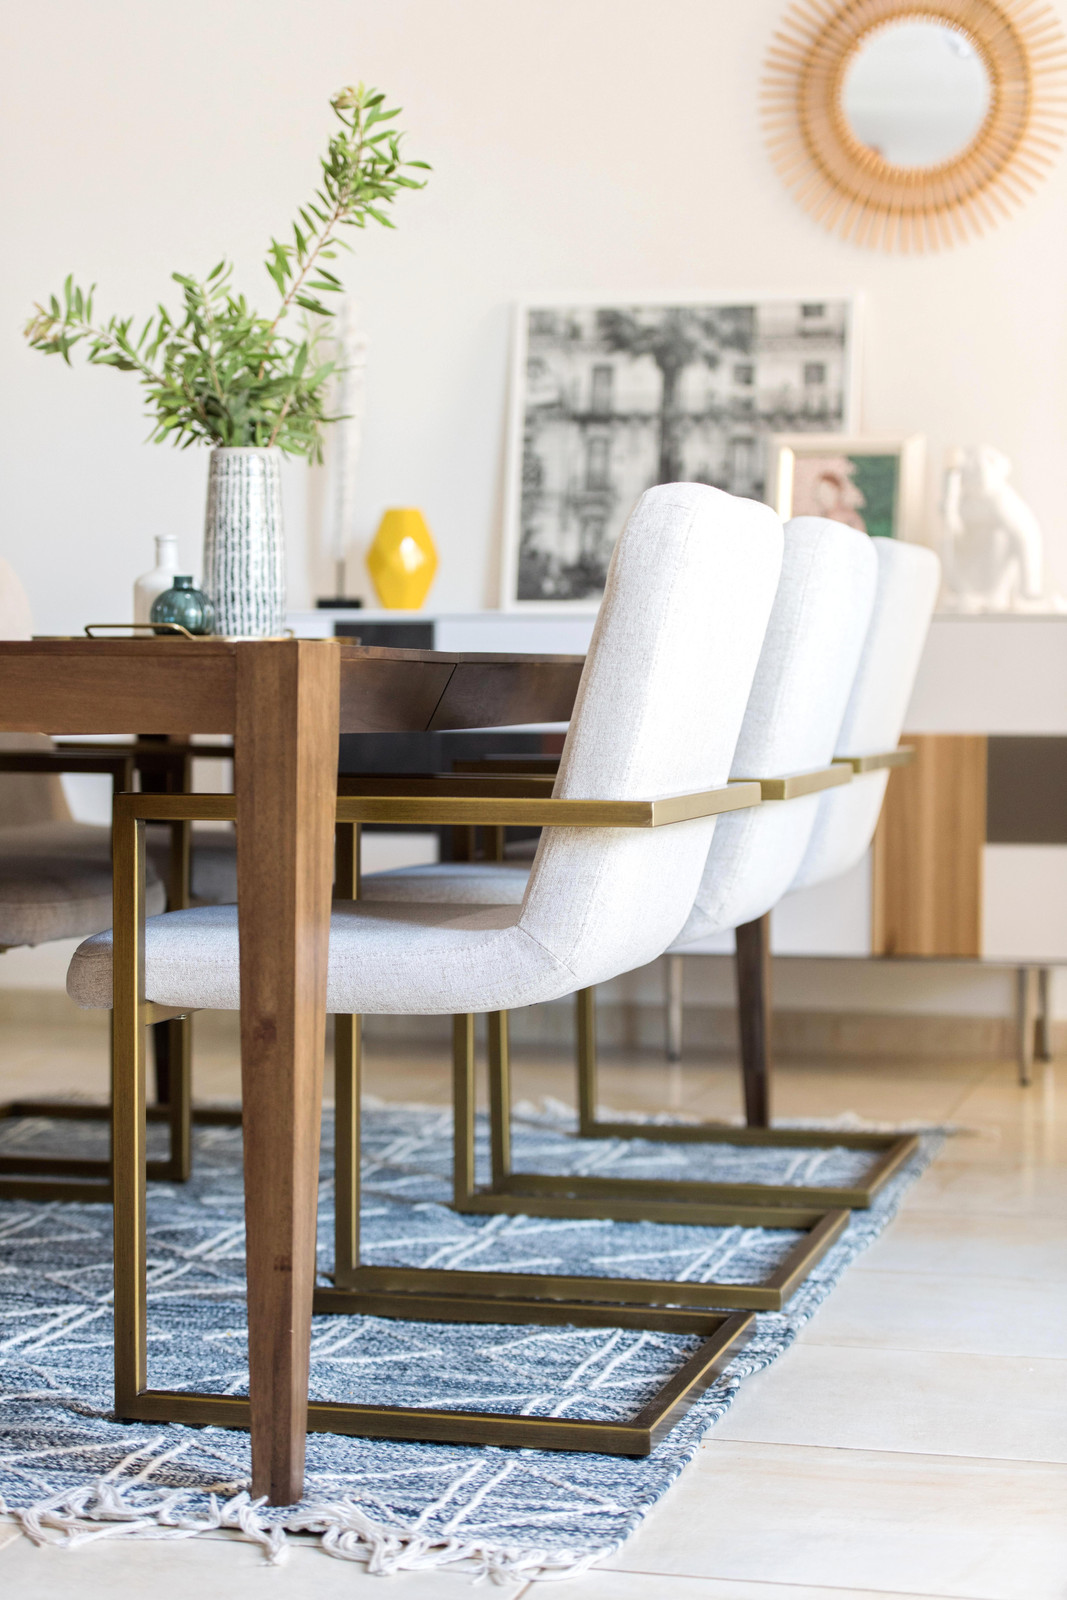 C Est Ici Decor Interior Design Styling Home Dubai Fullscreen Page